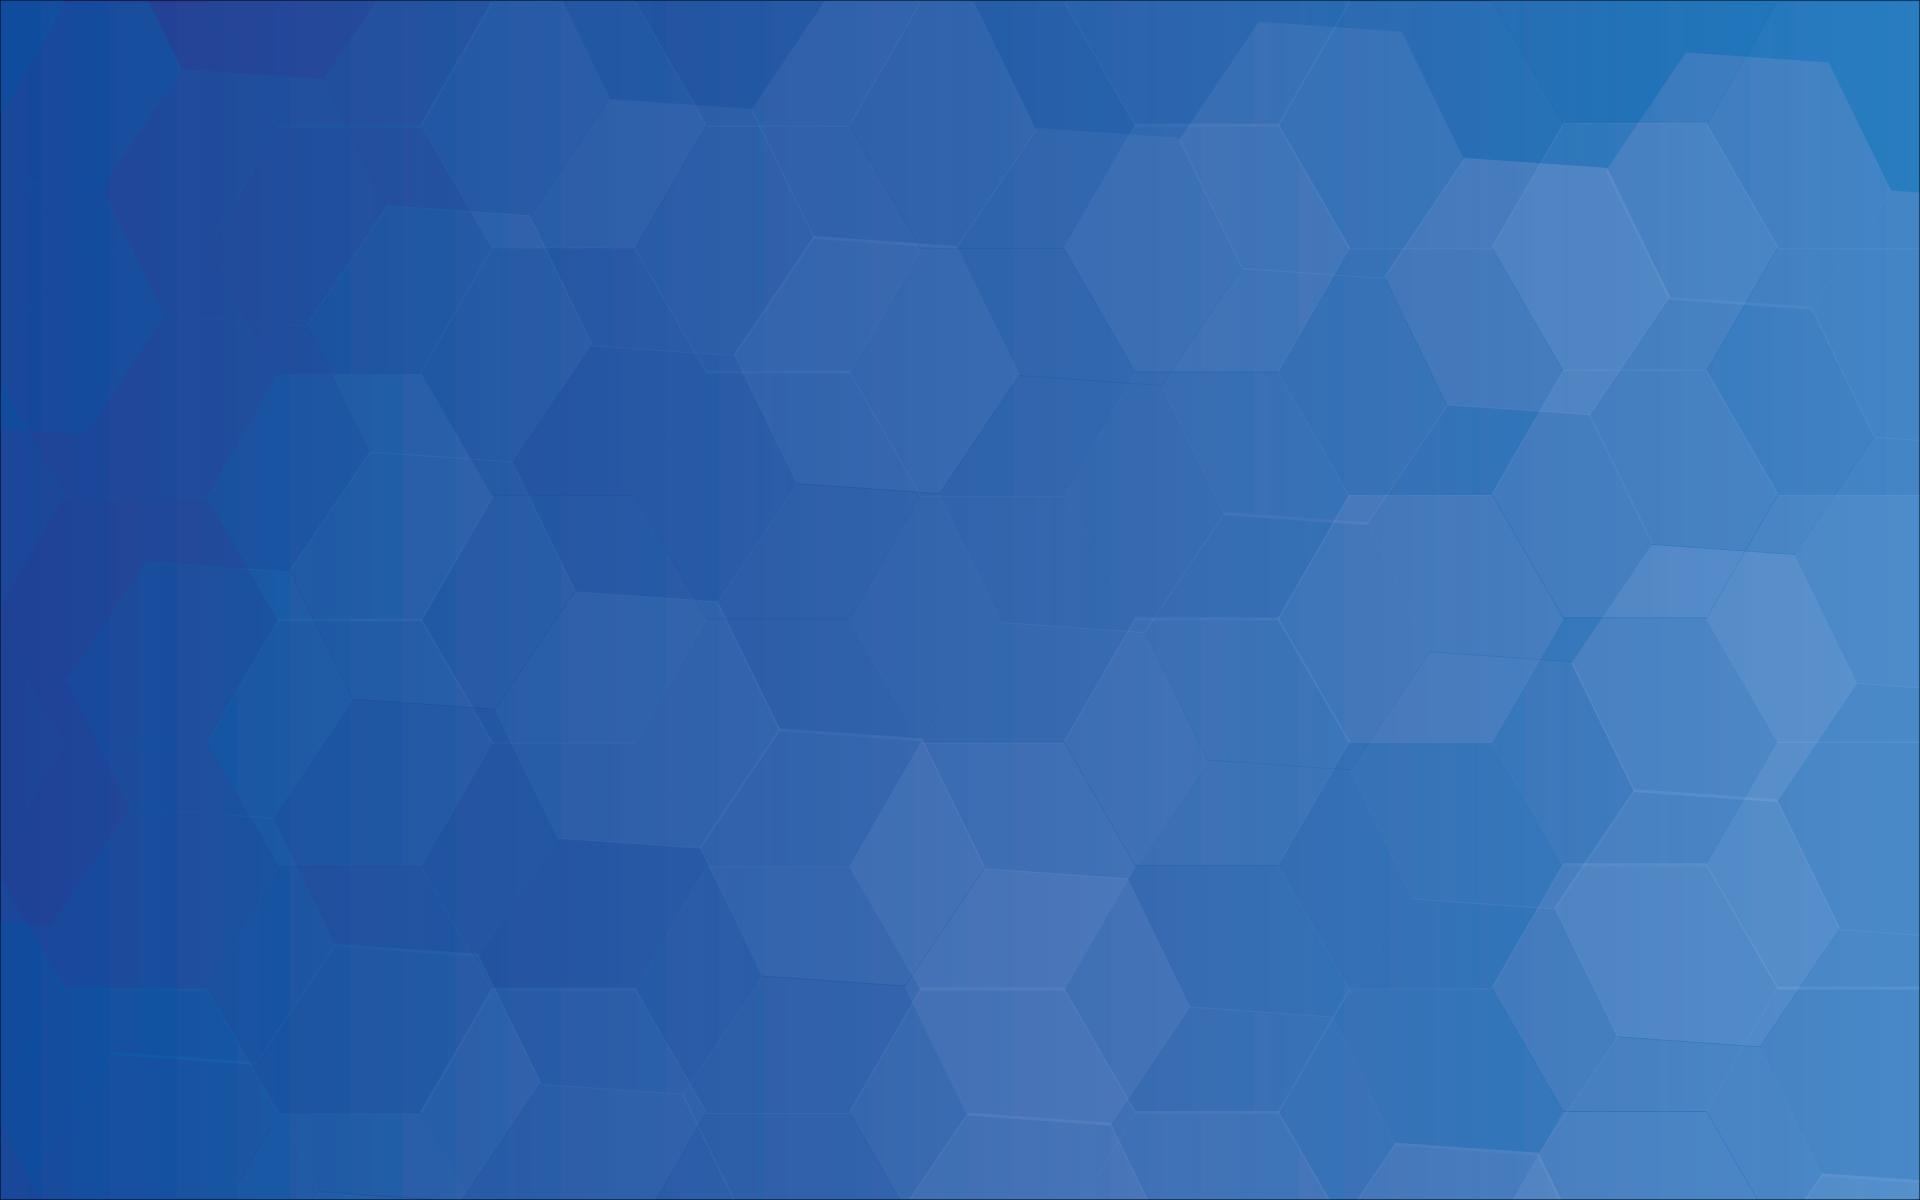 Geometry Hexagon 1920x1200